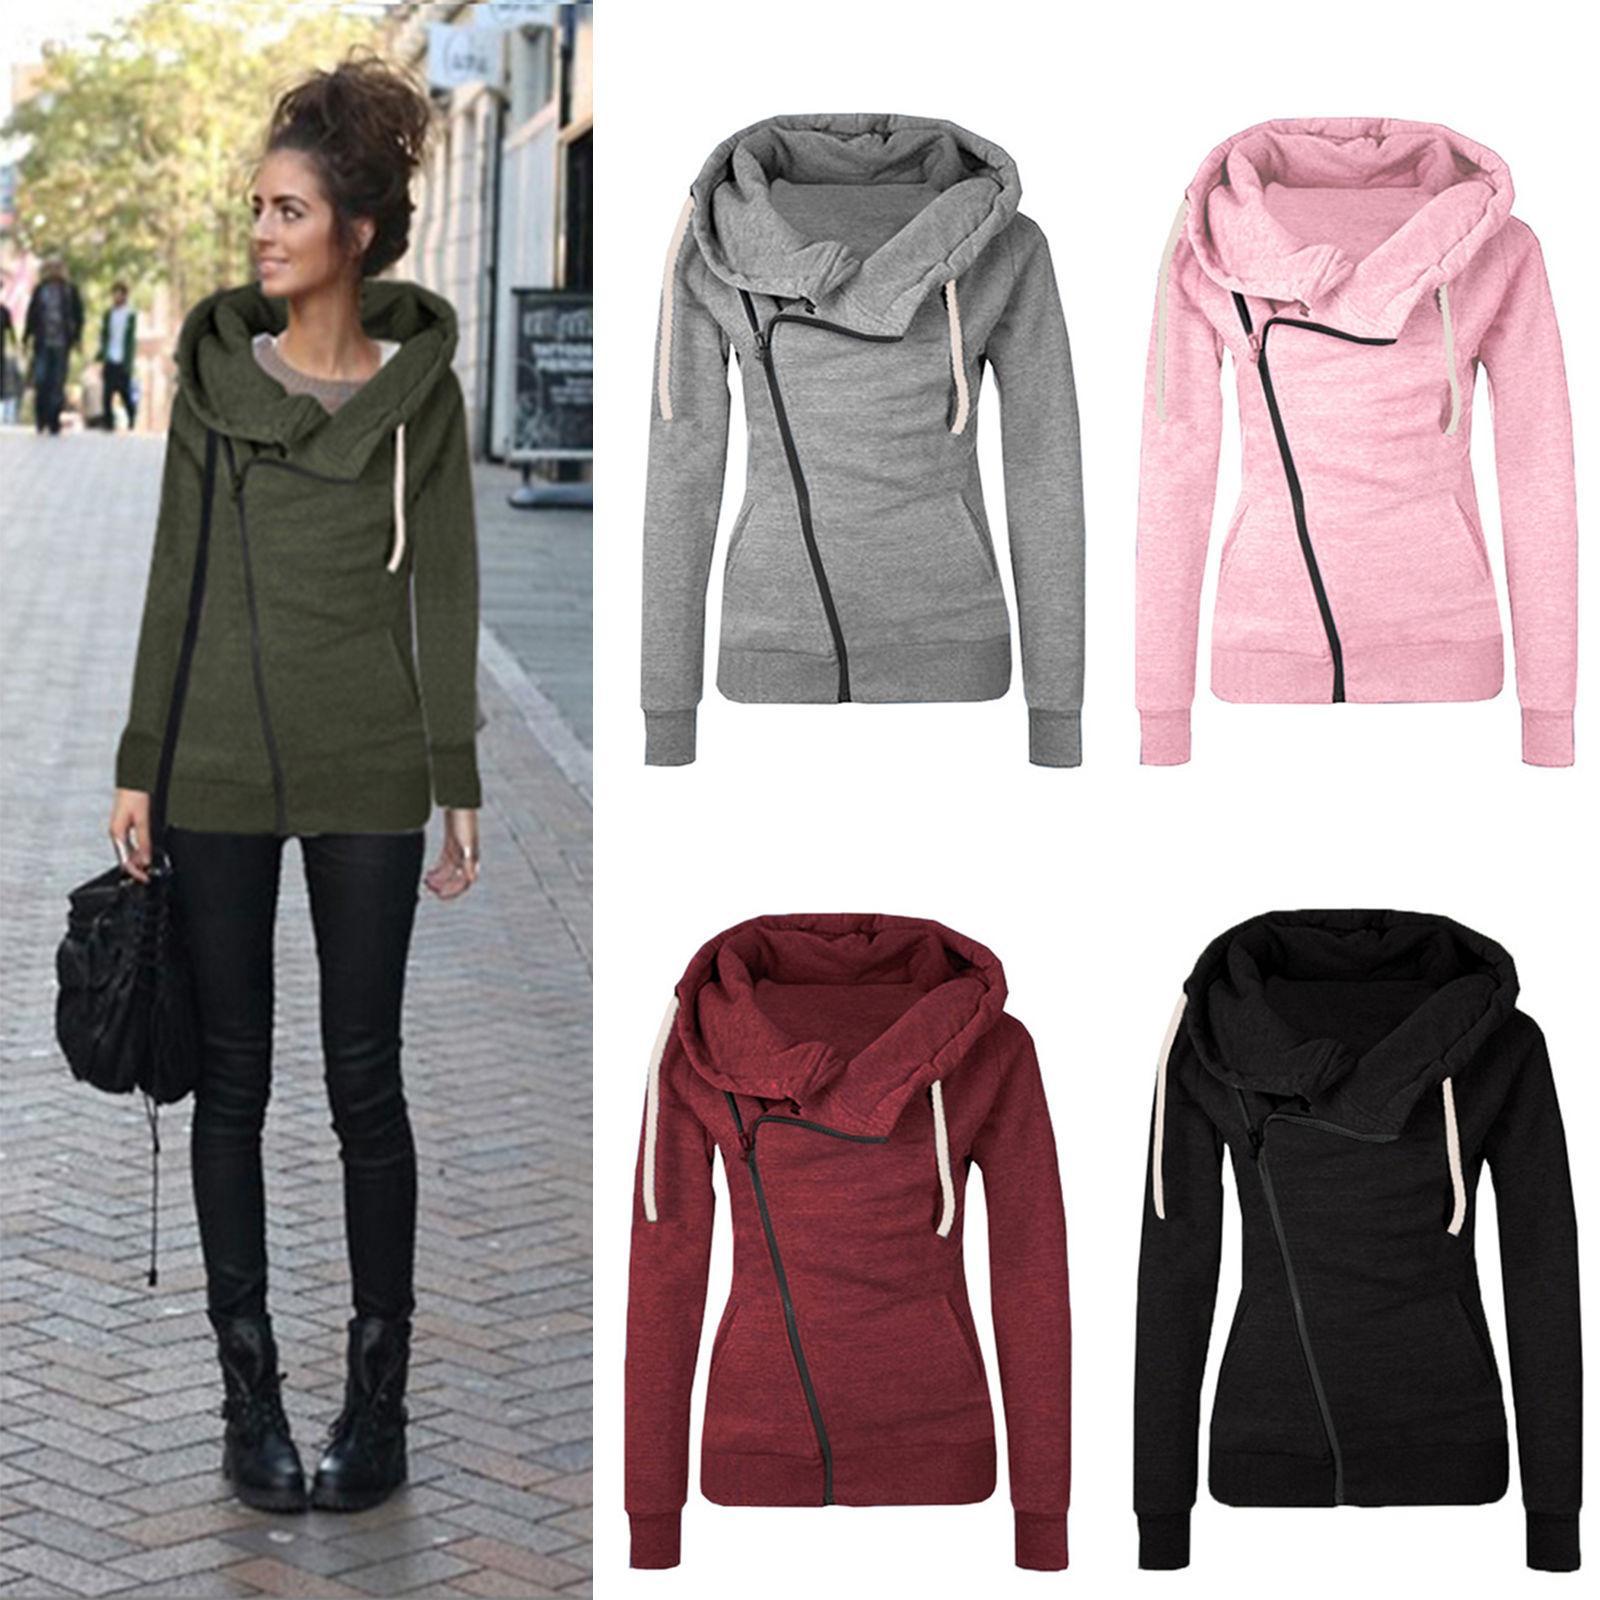 Fashion Womens Ladies Oblique Zipper Sweater Sweatshirt Long ...